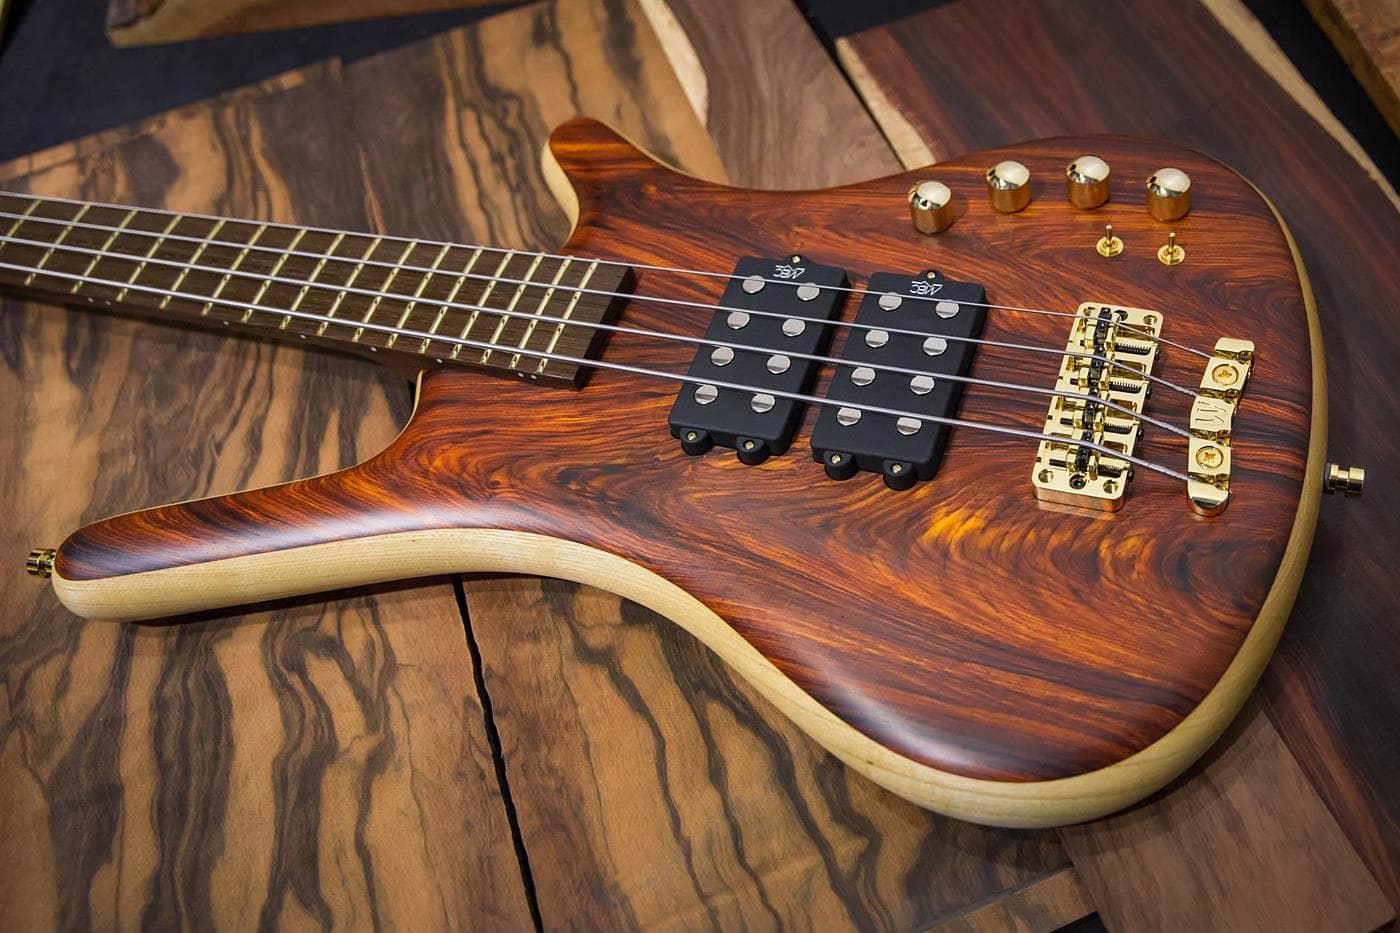 gamme mineure pentatonique a la guitare basse 0